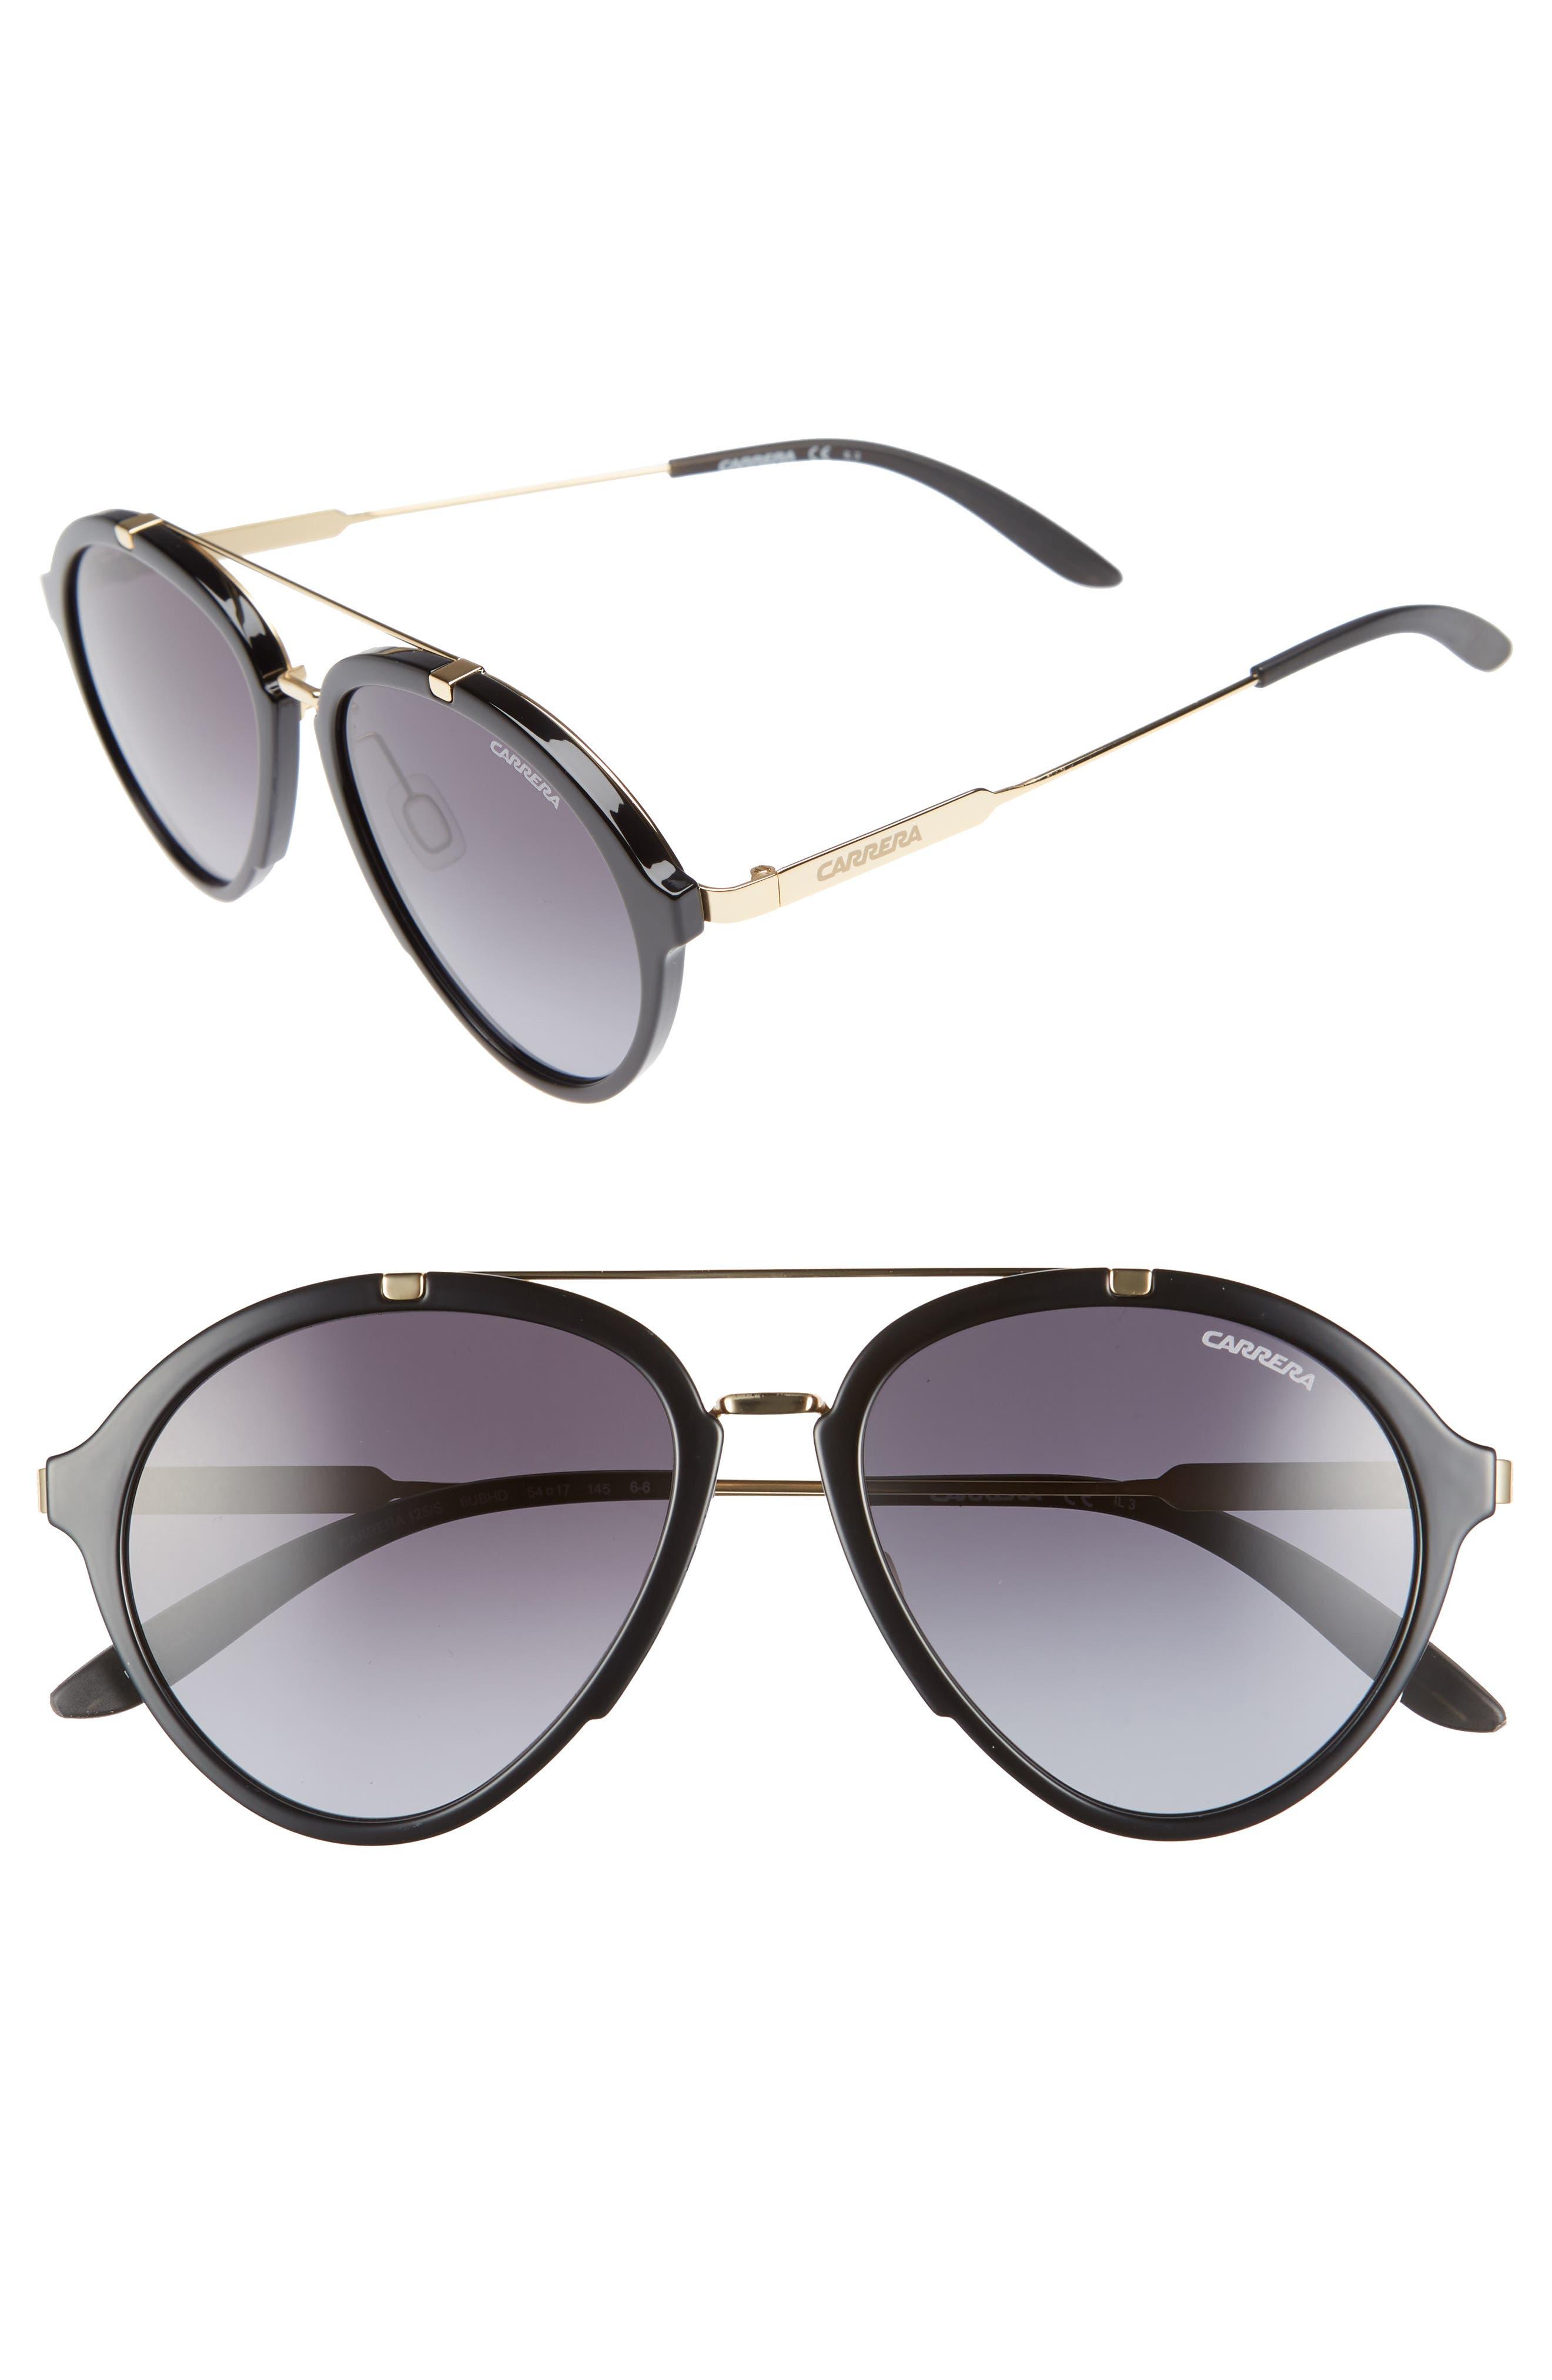 54mm Aviator Sunglasses,                         Main,                         color, Shiny Black Gold